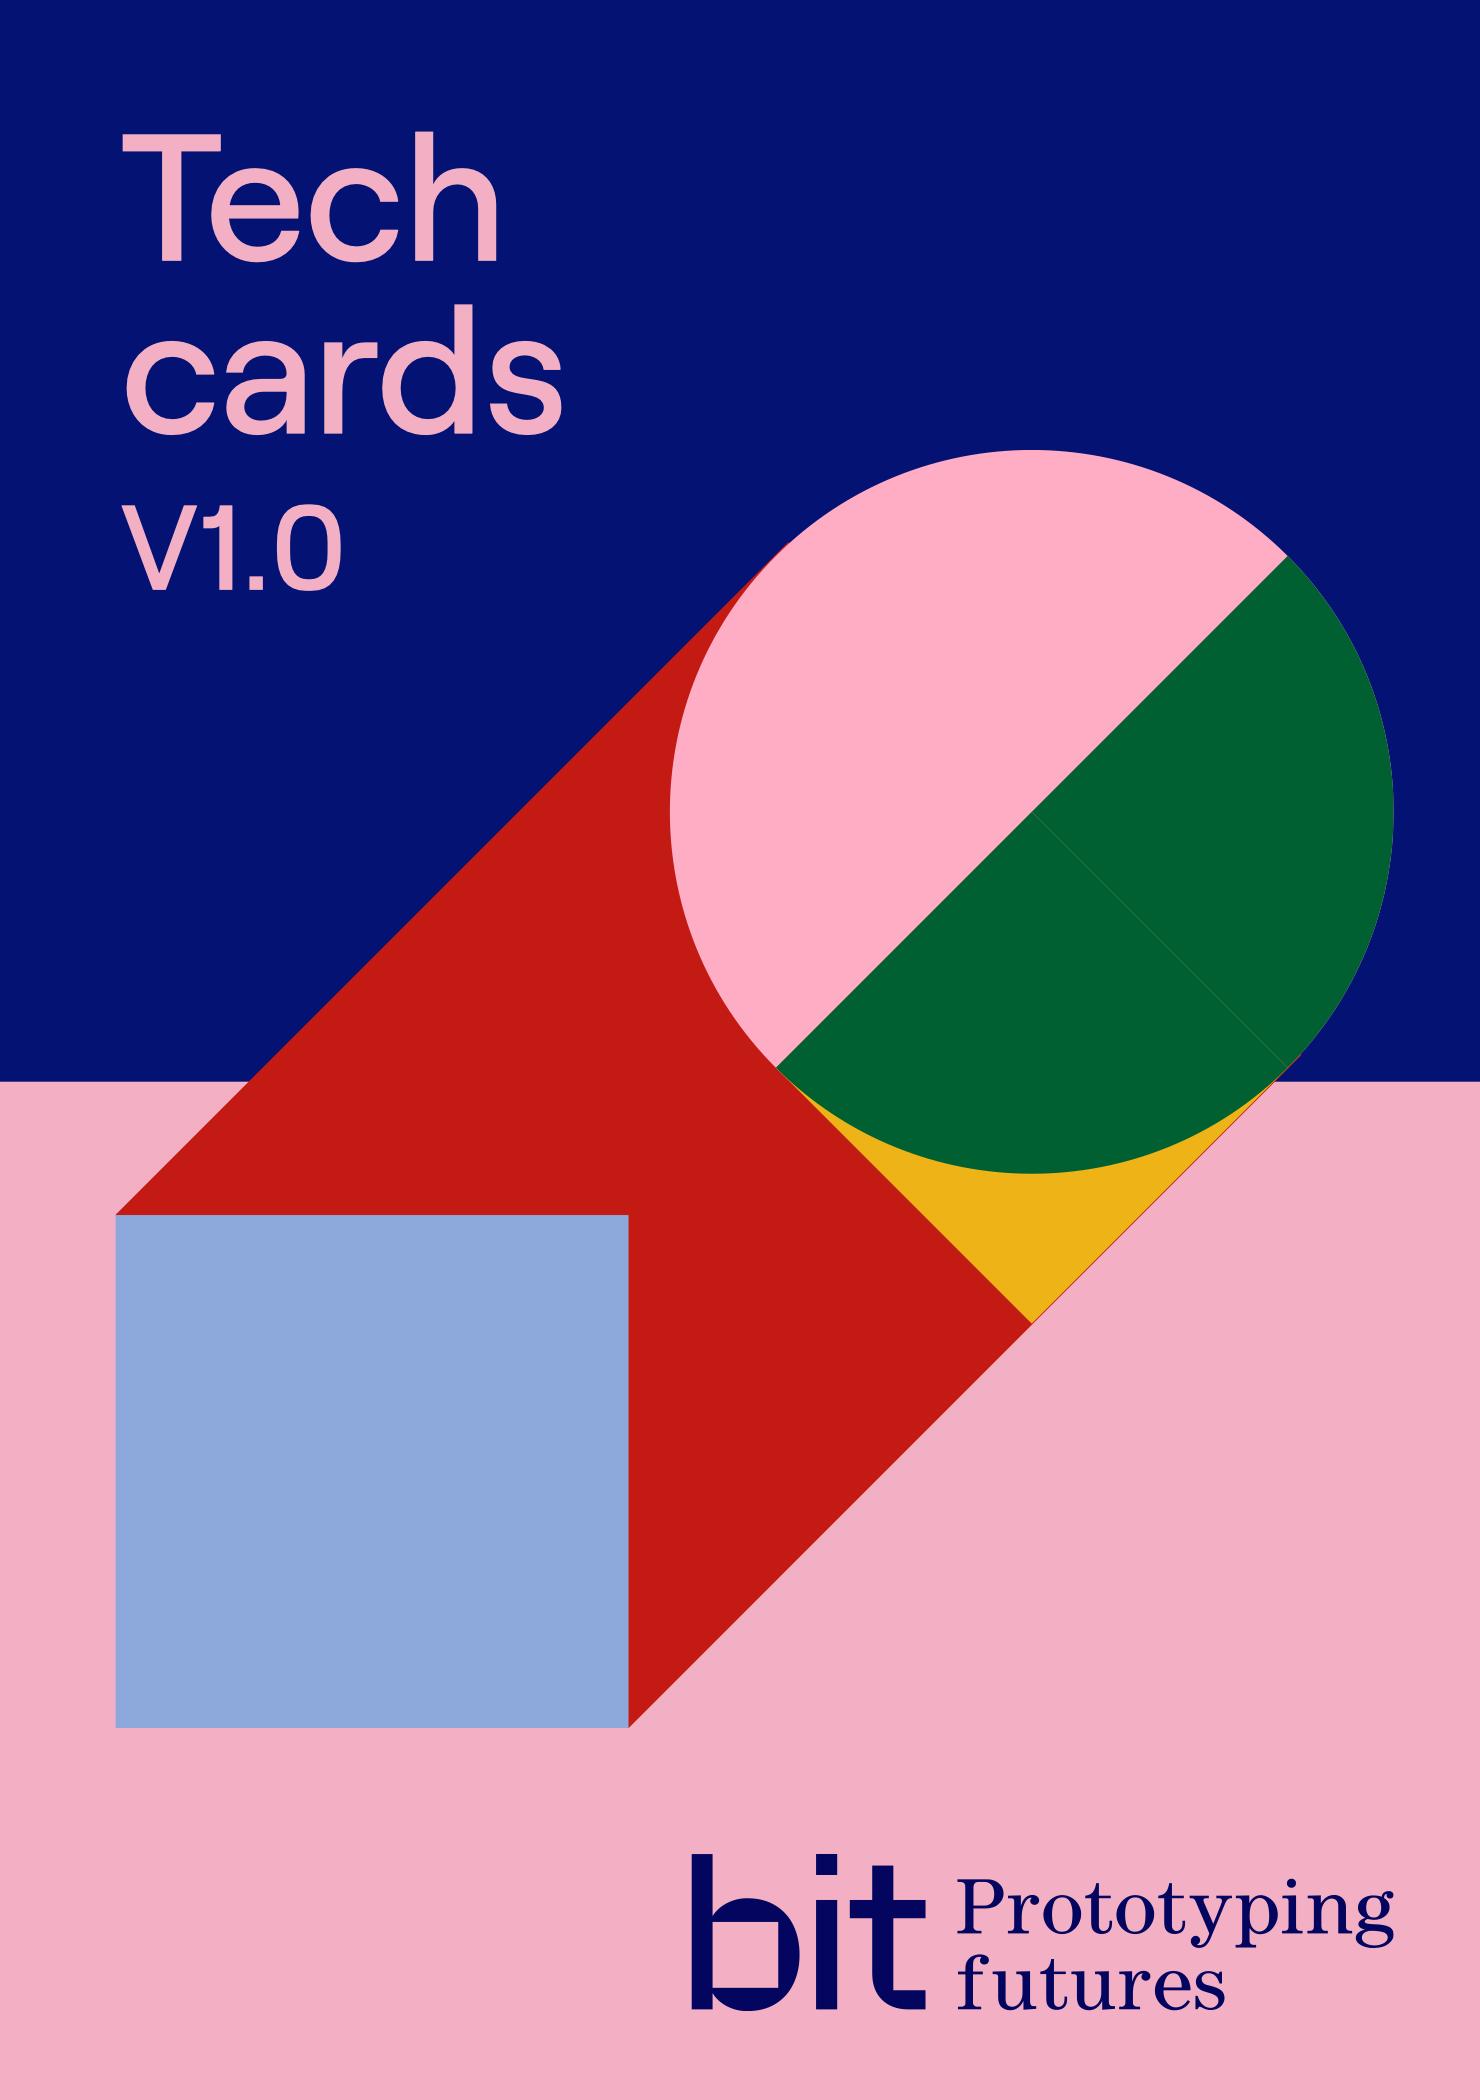 Bit_prototyping Tech brainstorm cards